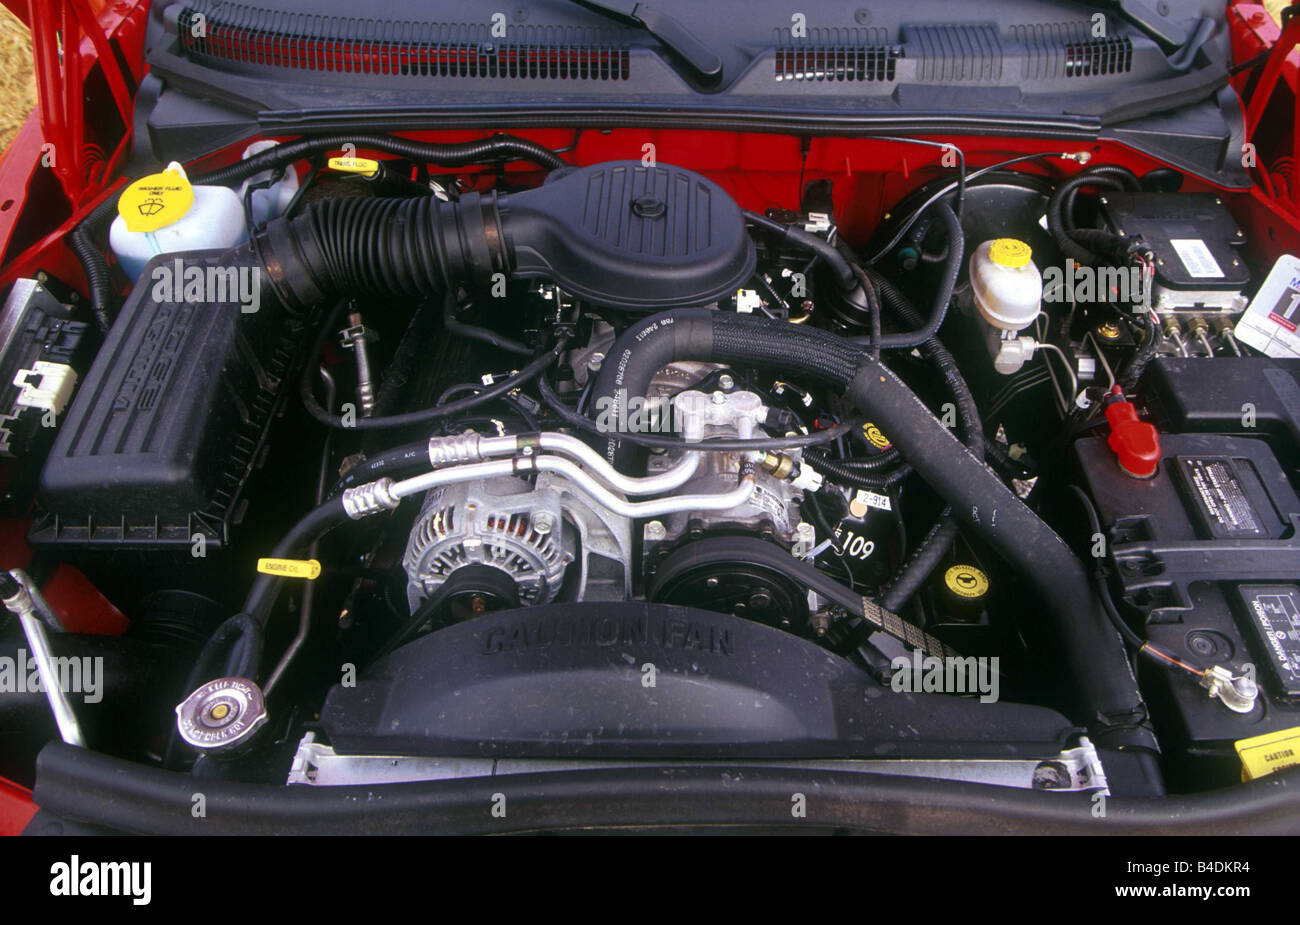 dodge dakota engines Auto, Chrysler Dodge Dakota, Pick-Up, Modelljahr 2-, rot, Blick